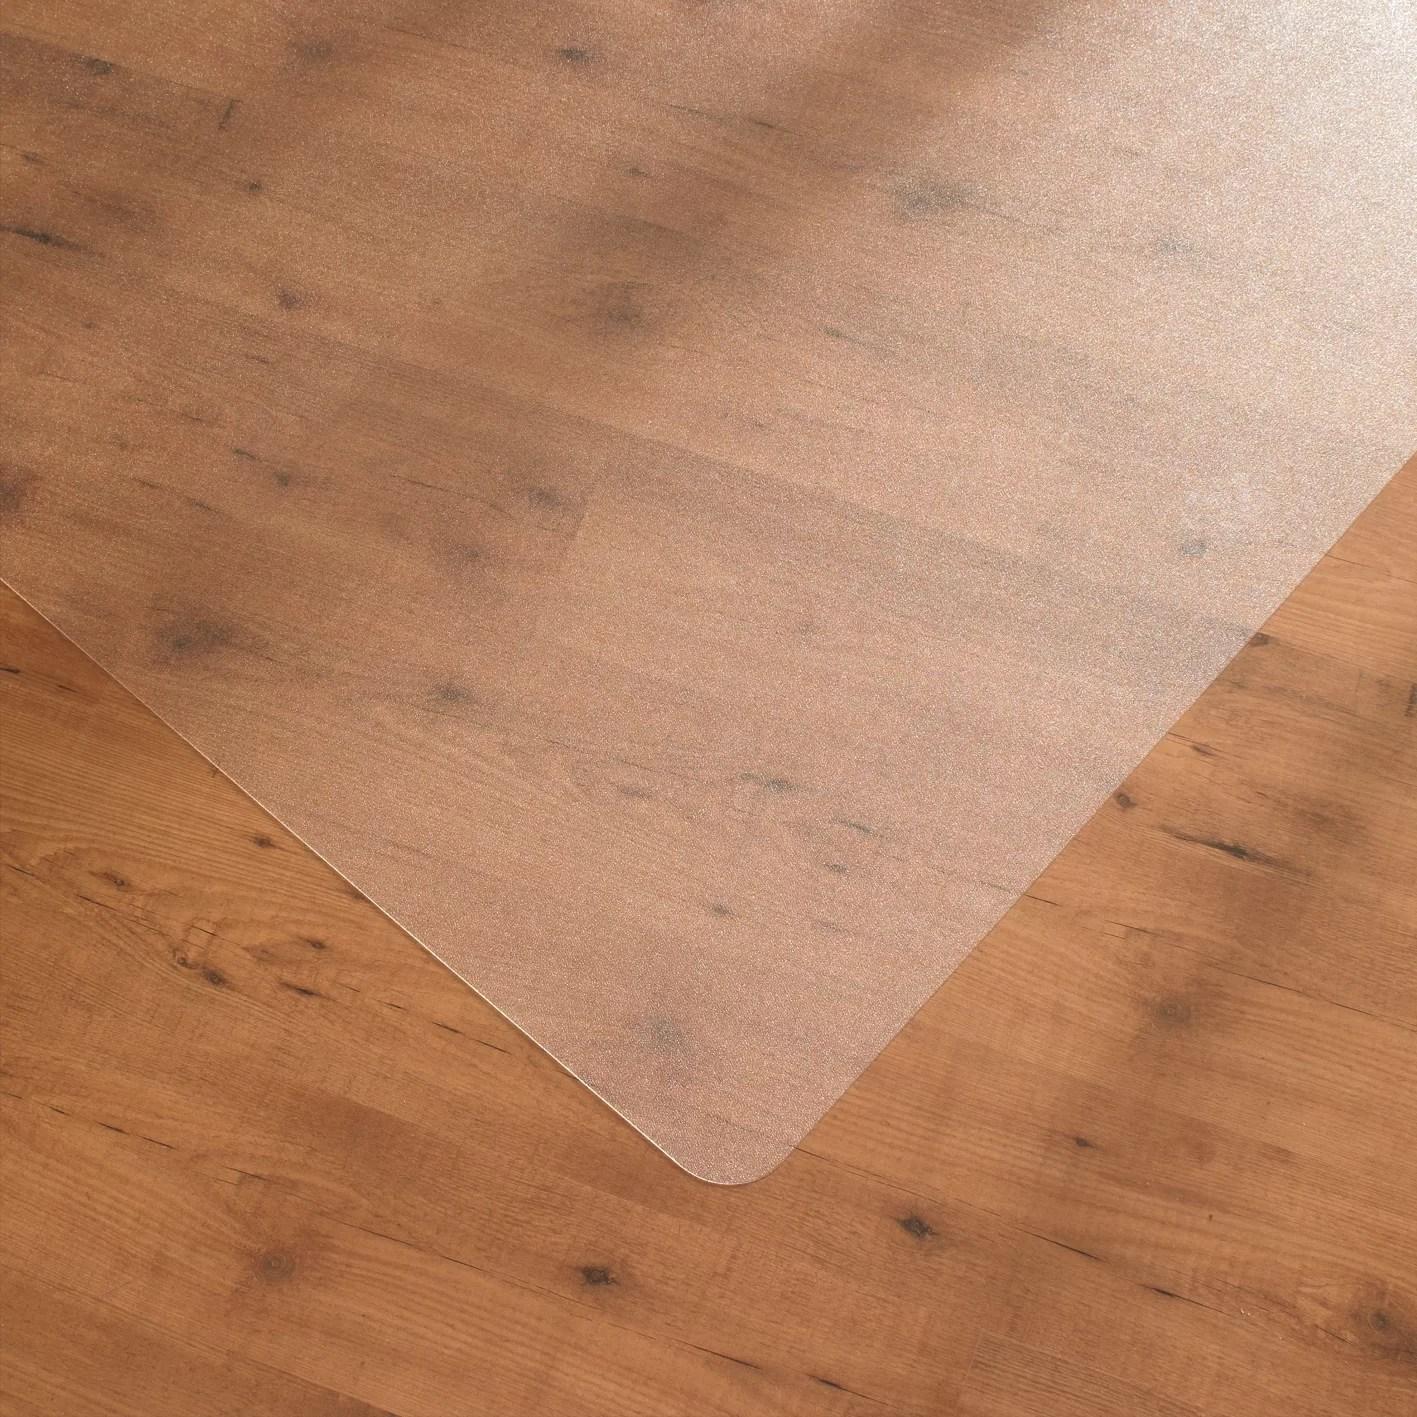 floortex chair mat motorized chairs for elderly cleartex anti slip unomat low pile carpet